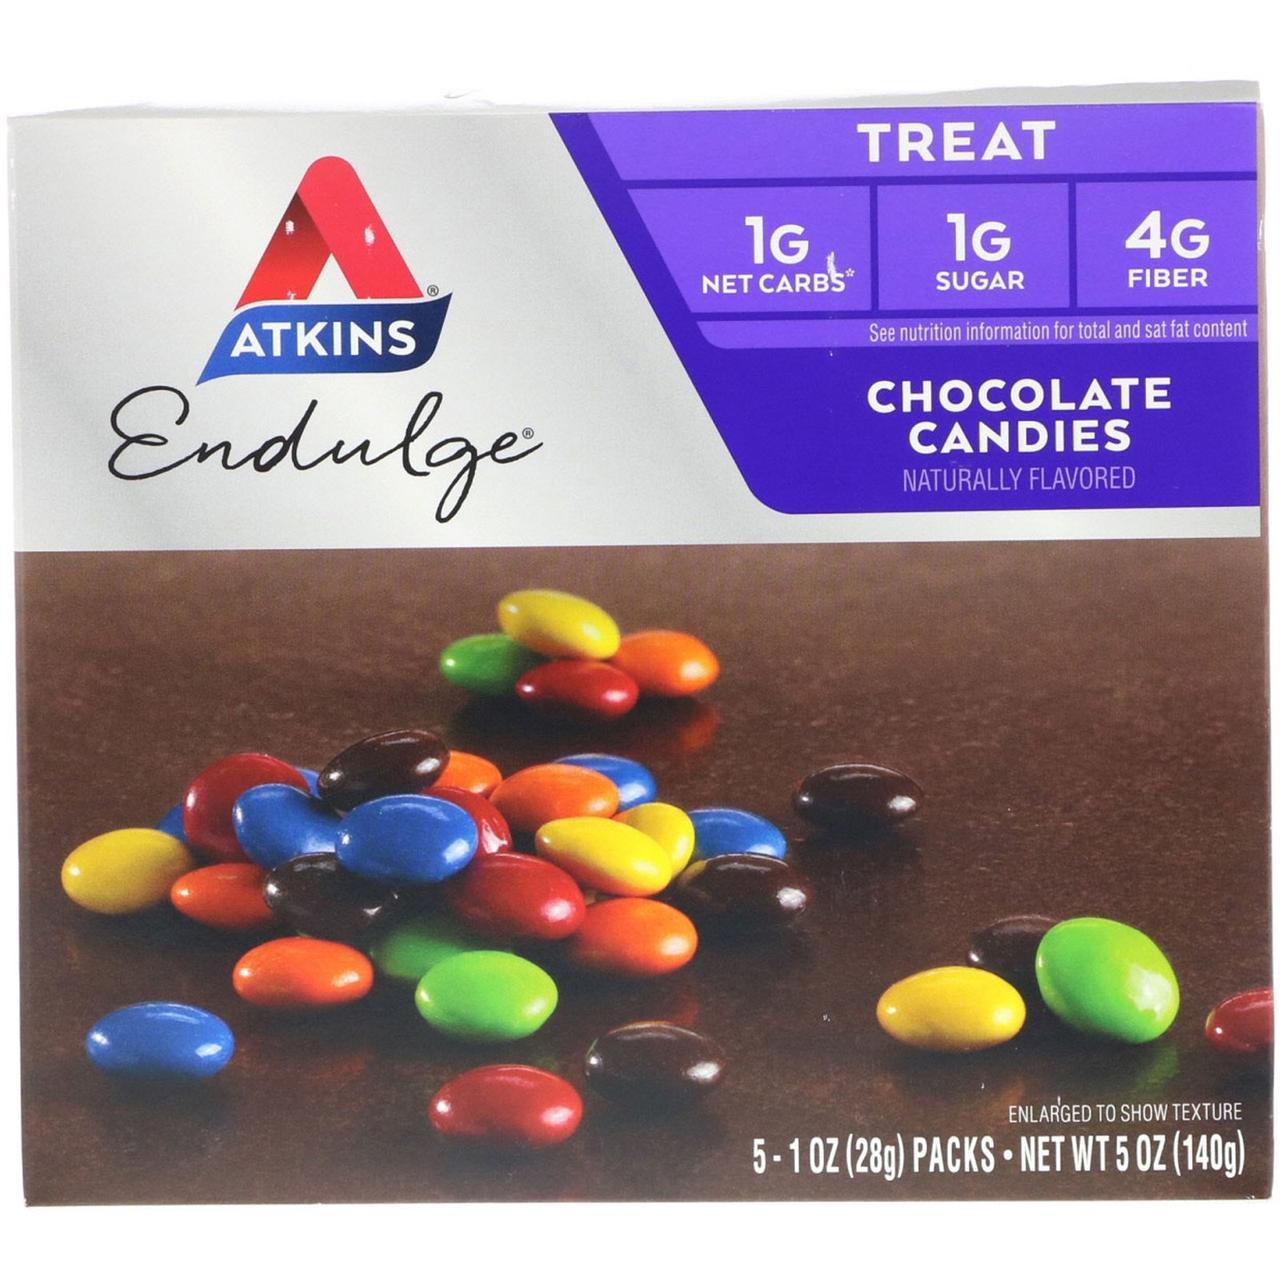 Шоколадные конфеты, Chocolate Candies, Atkins, Treat Endulge, 5 пакетов